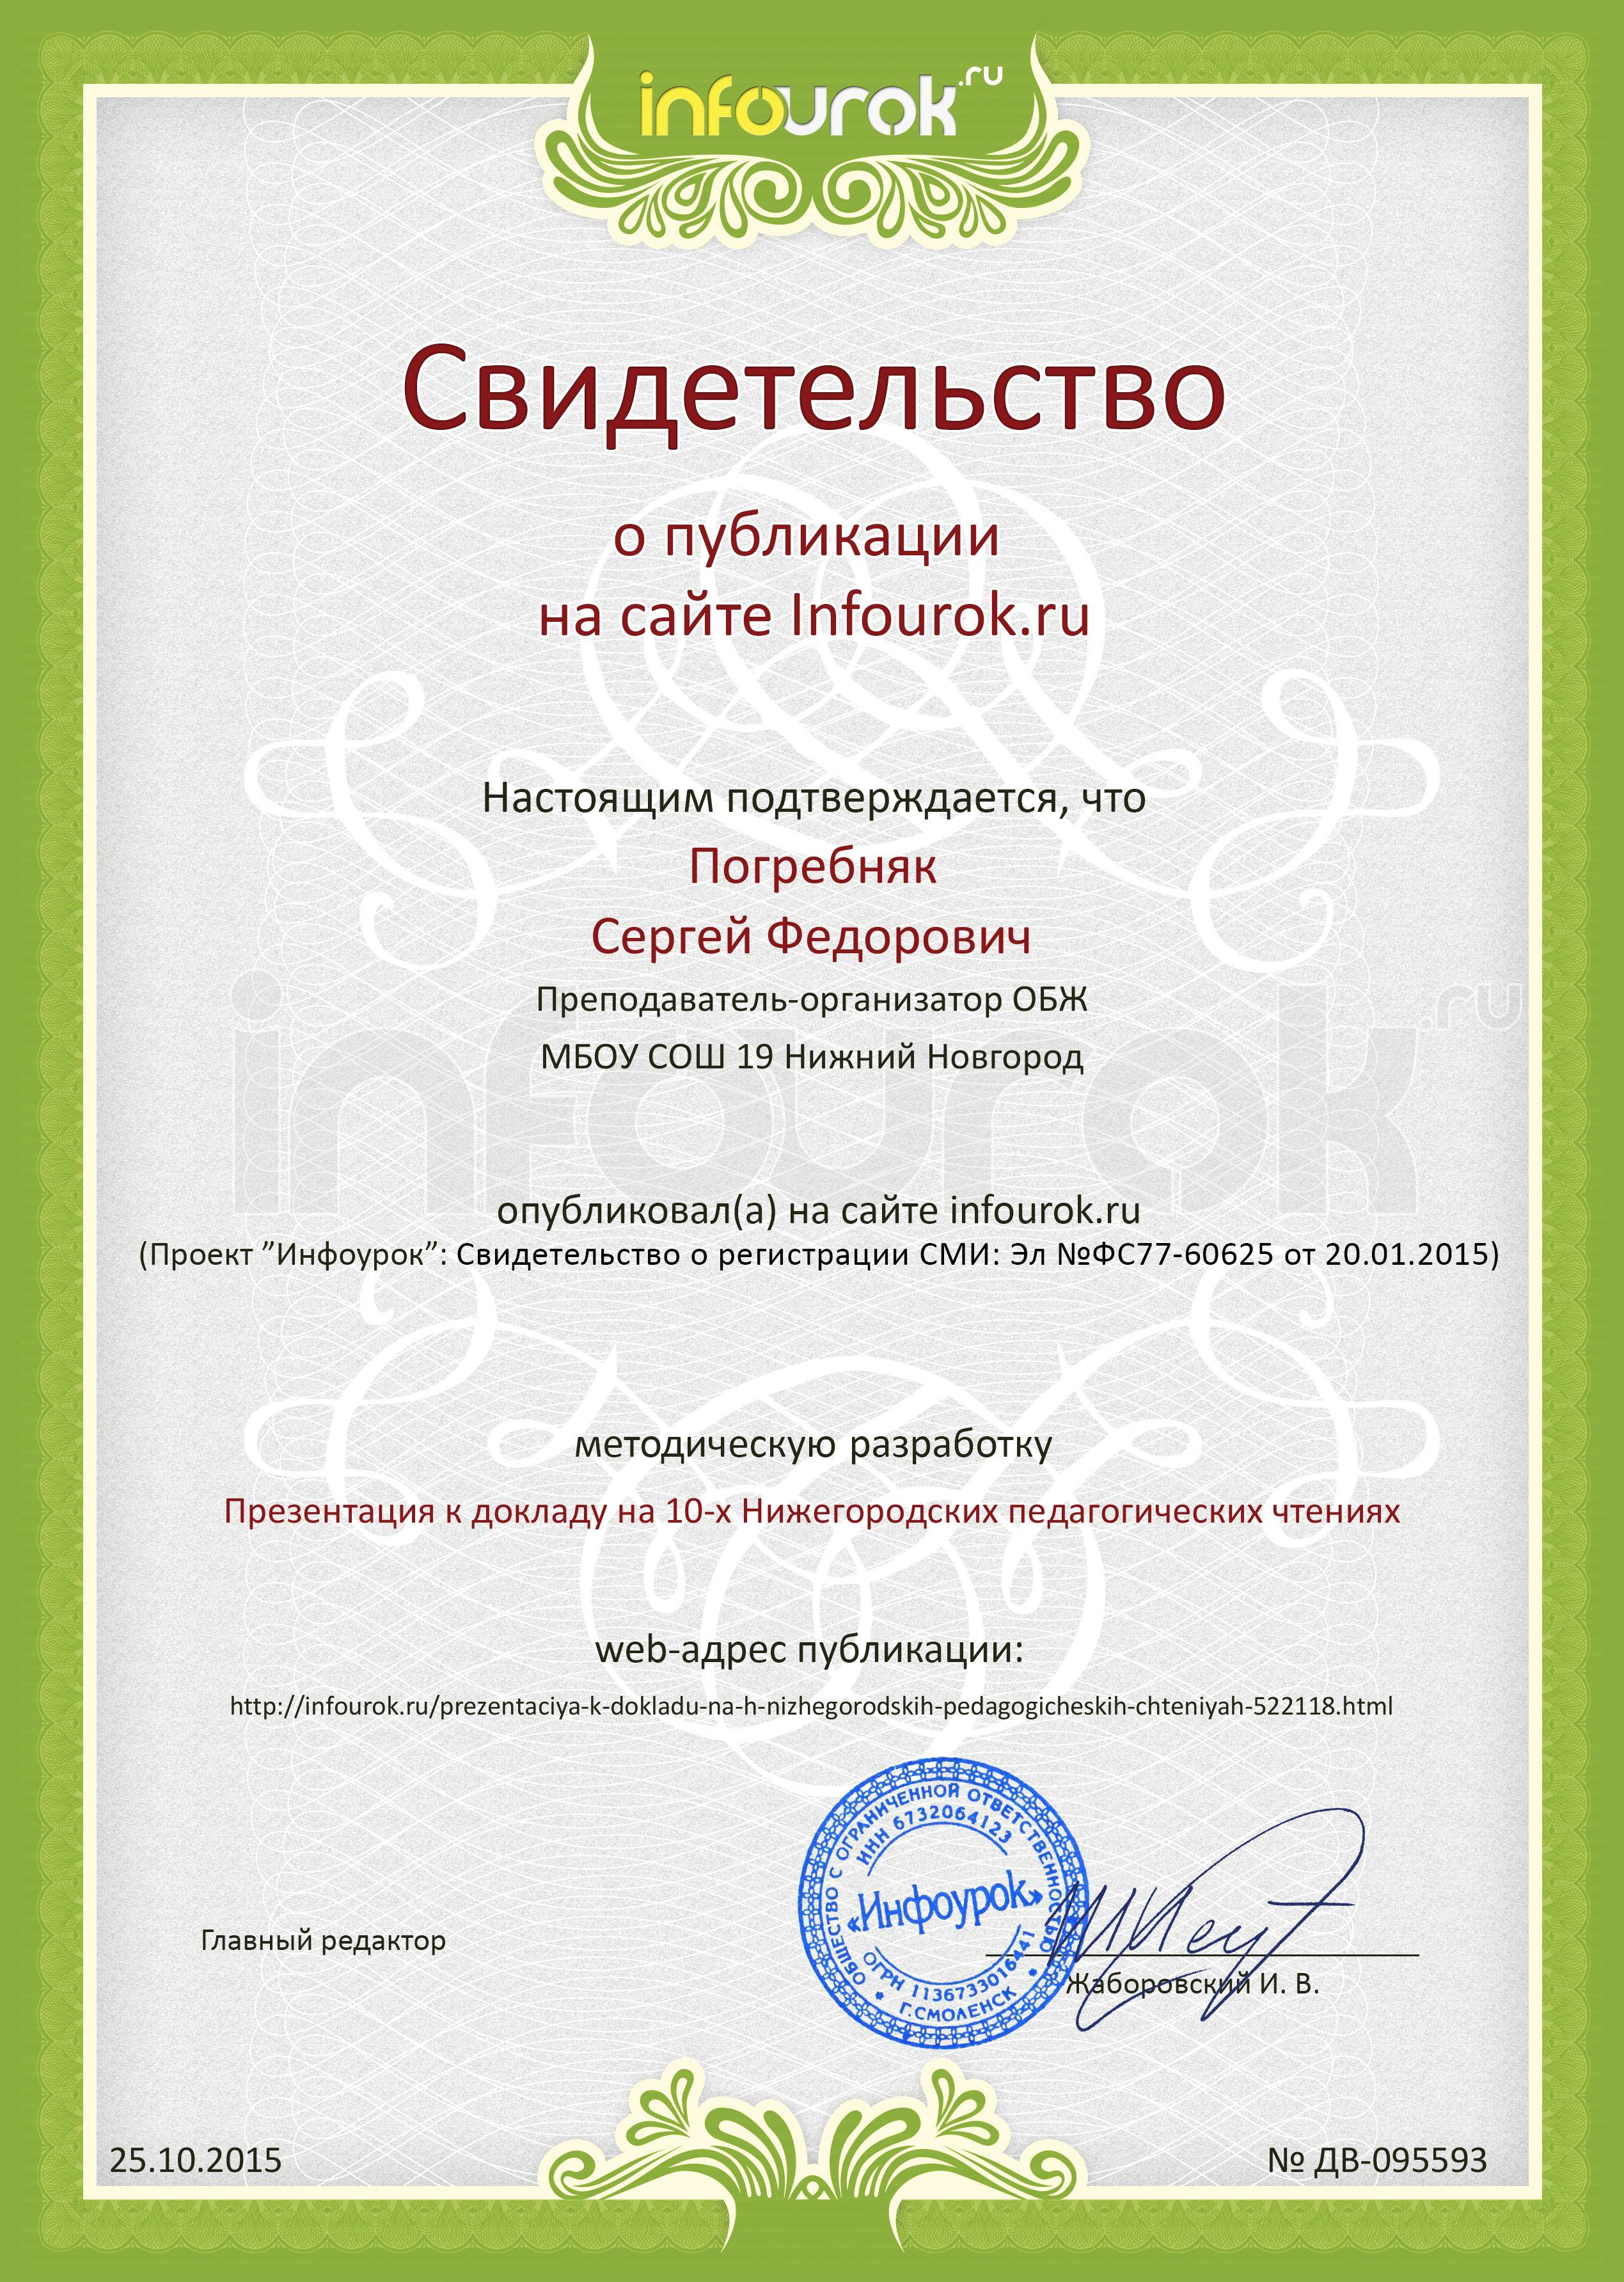 Сертификат проекта infourok.ru № ДВ-095593.jpg